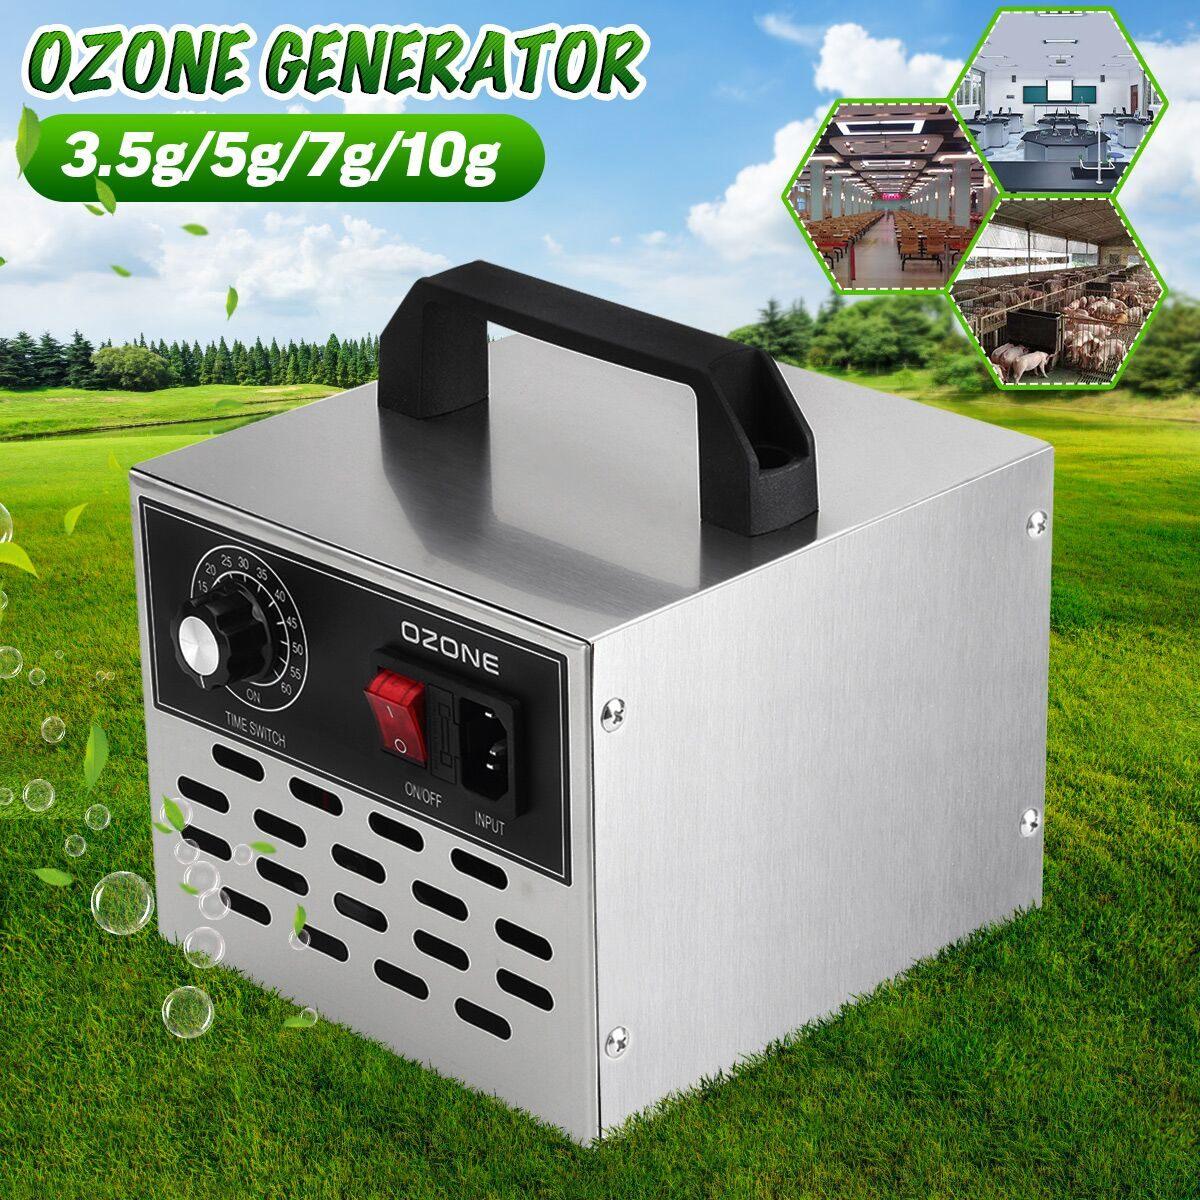 AUGIENB 220V 3.5g/5g/7g/10g/35g EU/US Plug Ozone Generator Air Purifiers Disinfection Machine Air Cleaner Sterilization Machine